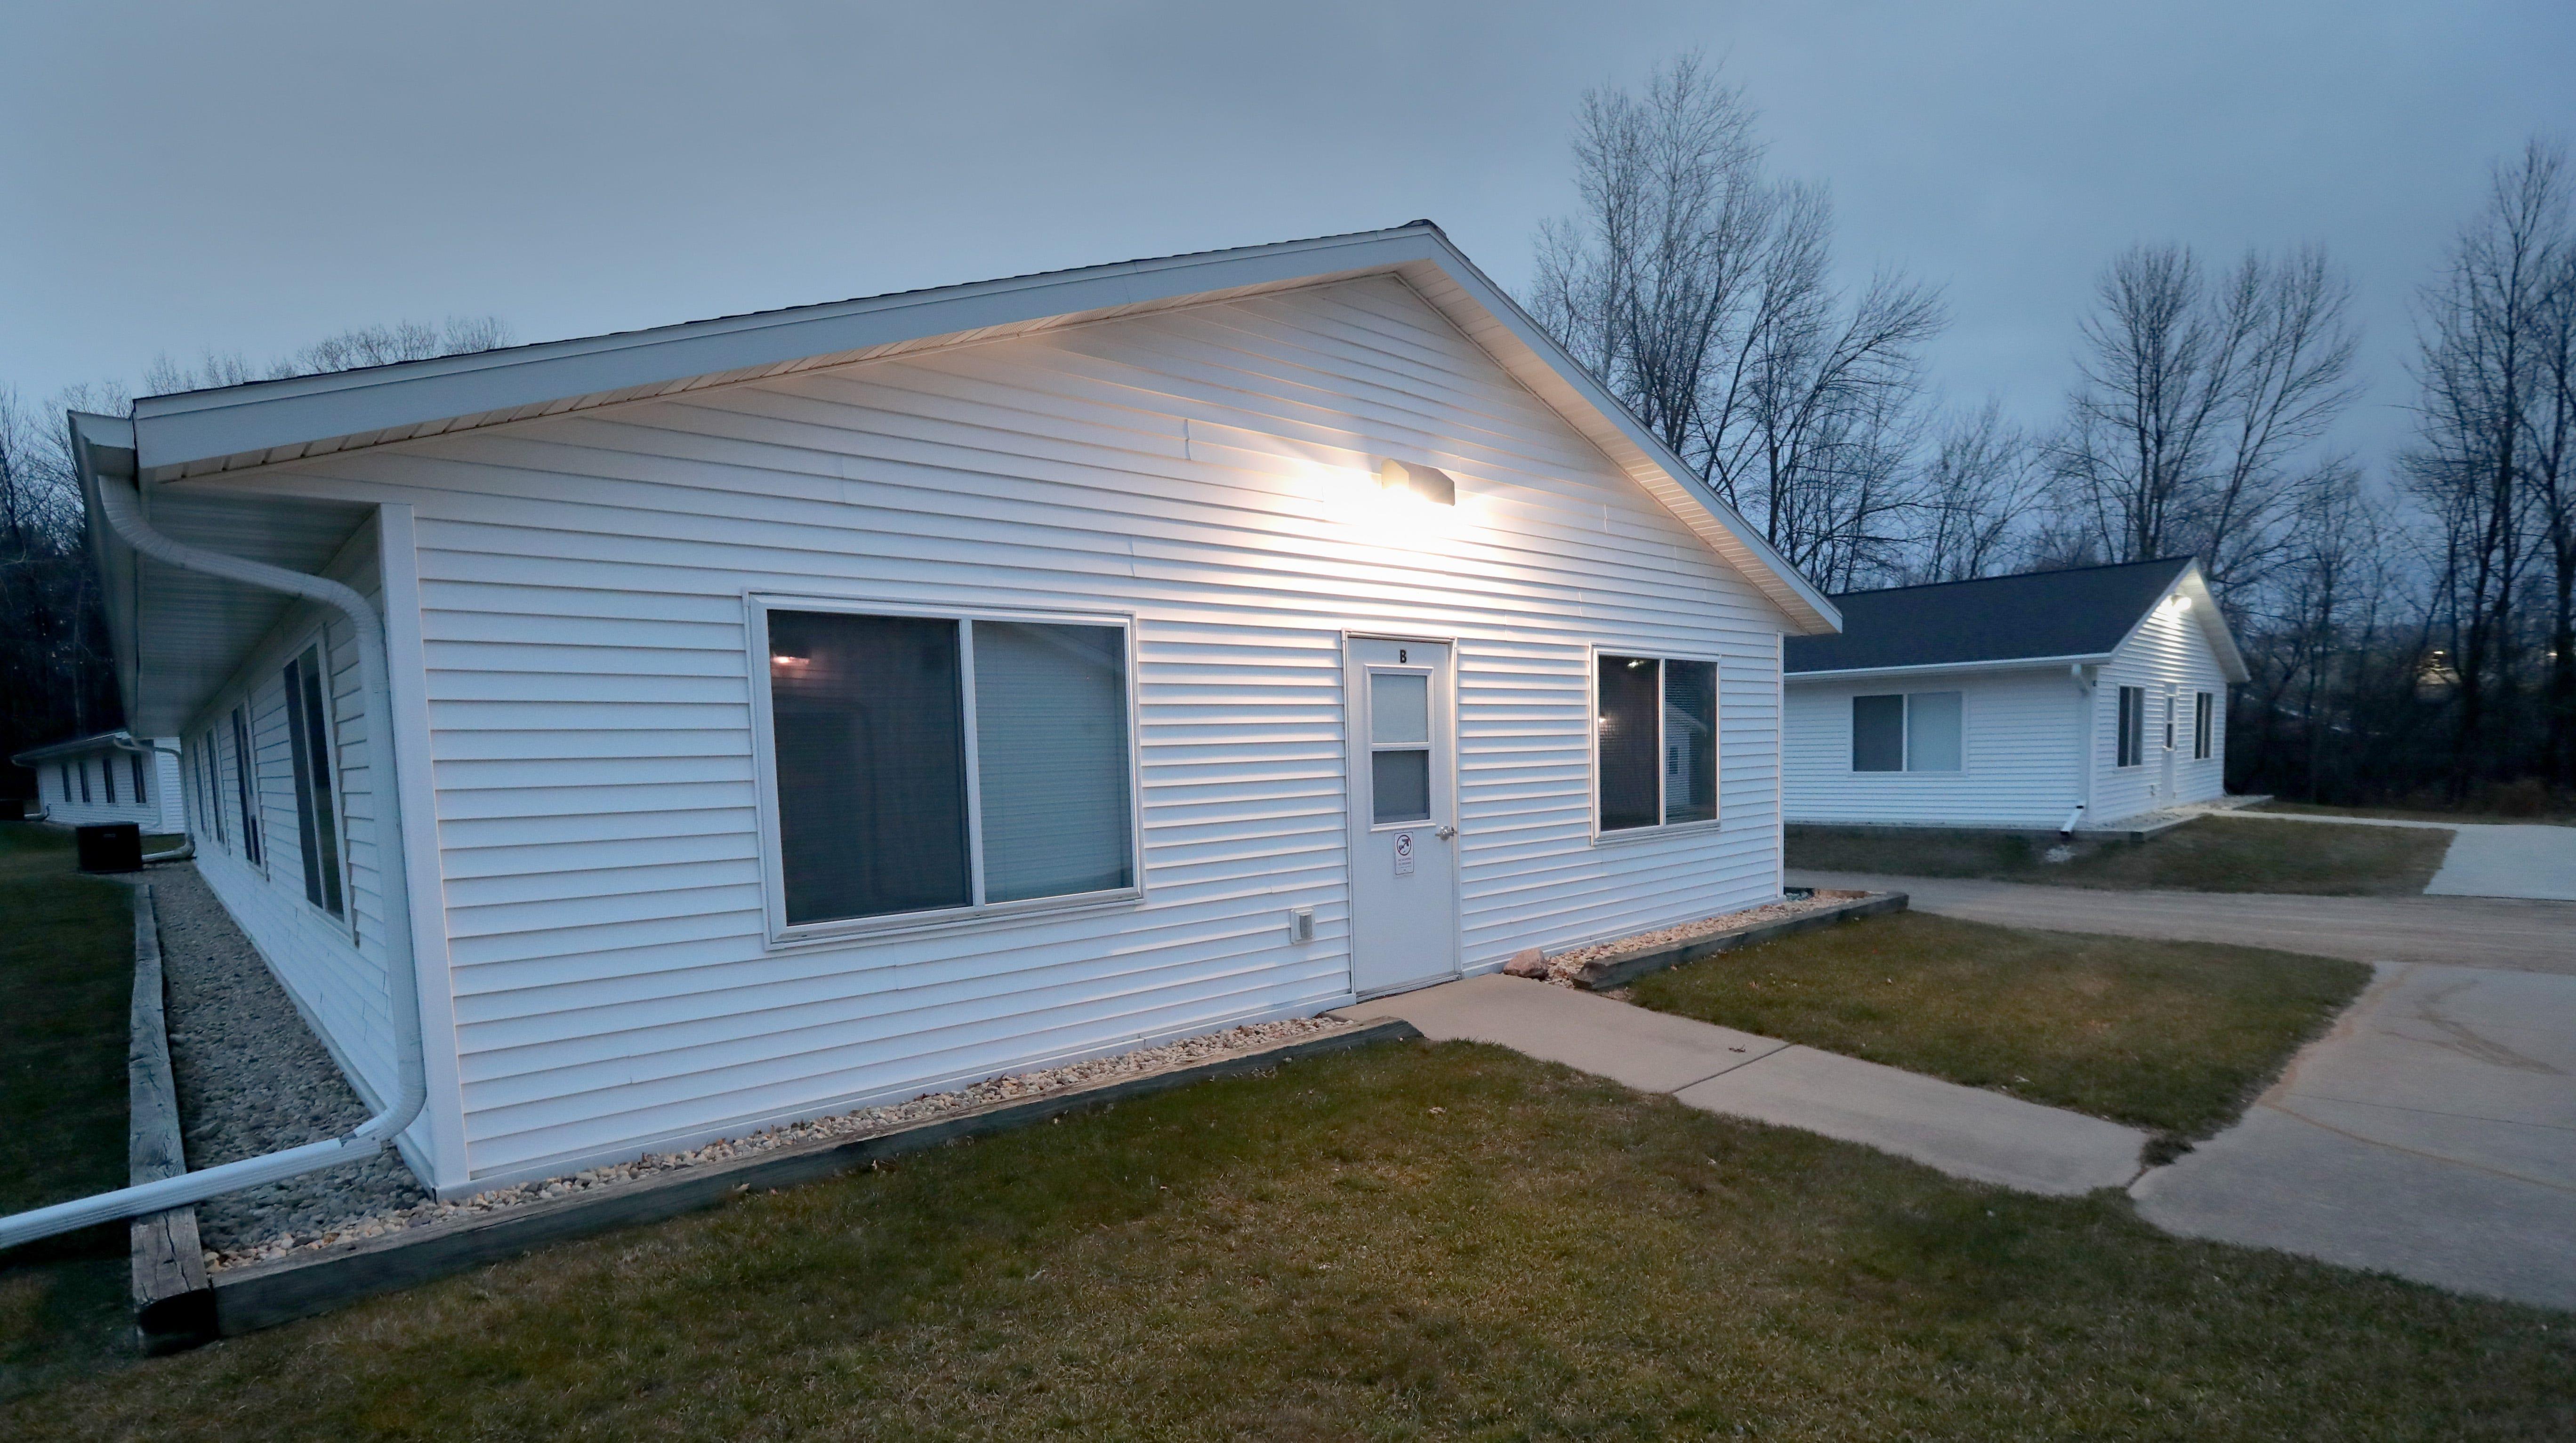 Housing for migrant workers at Seneca Foods in Gillett, Wisconsin.